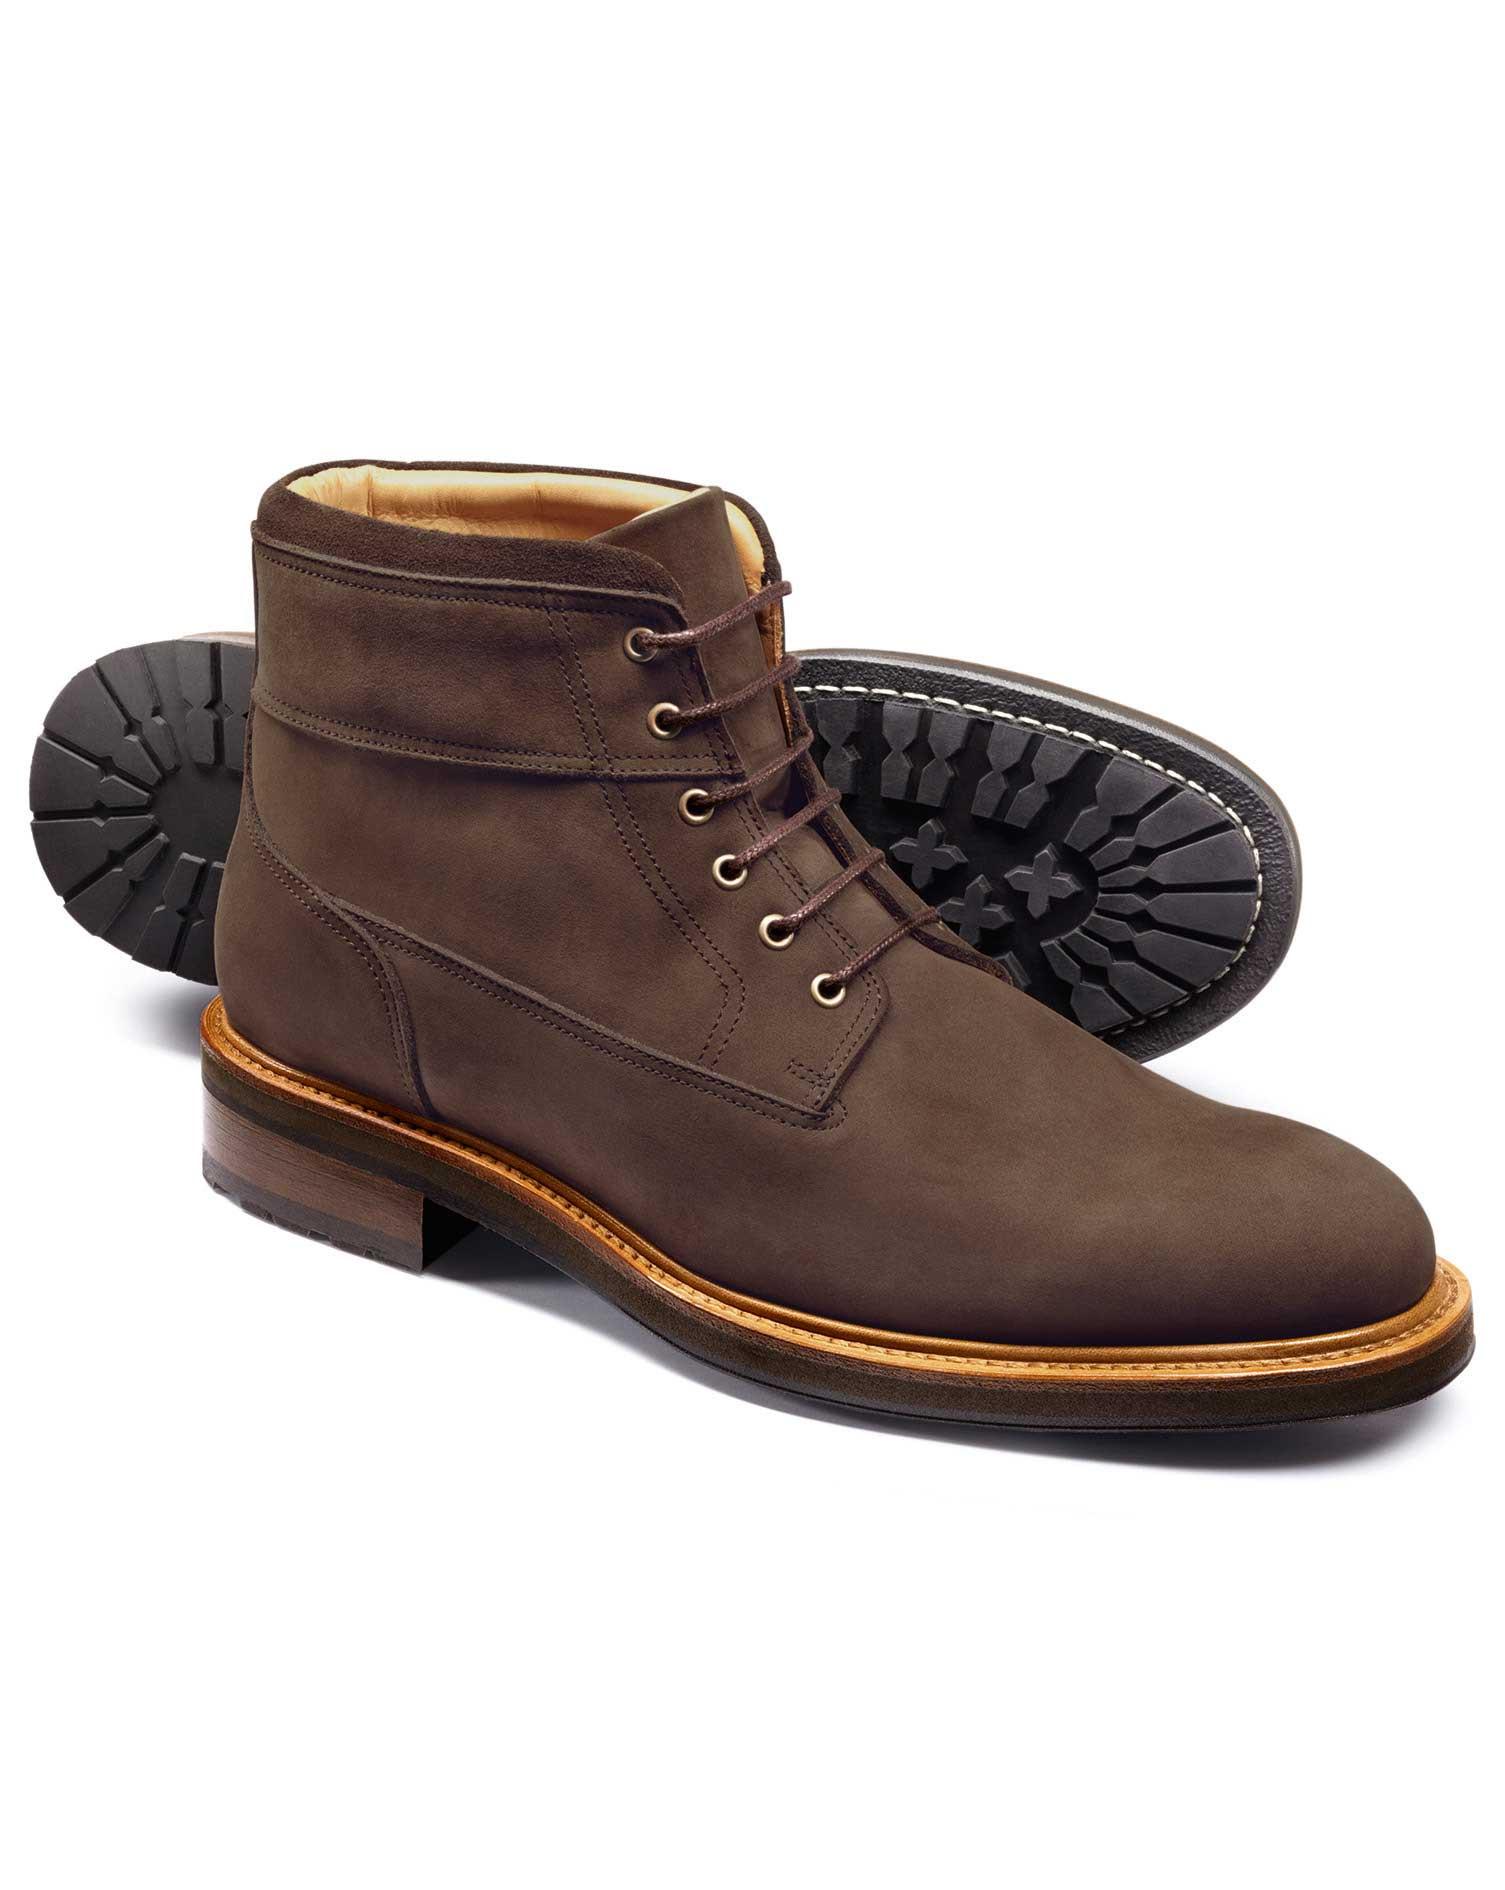 Dark Brown Nubuck Leather Commando Boots Size 13 R by Charles Tyrwhitt